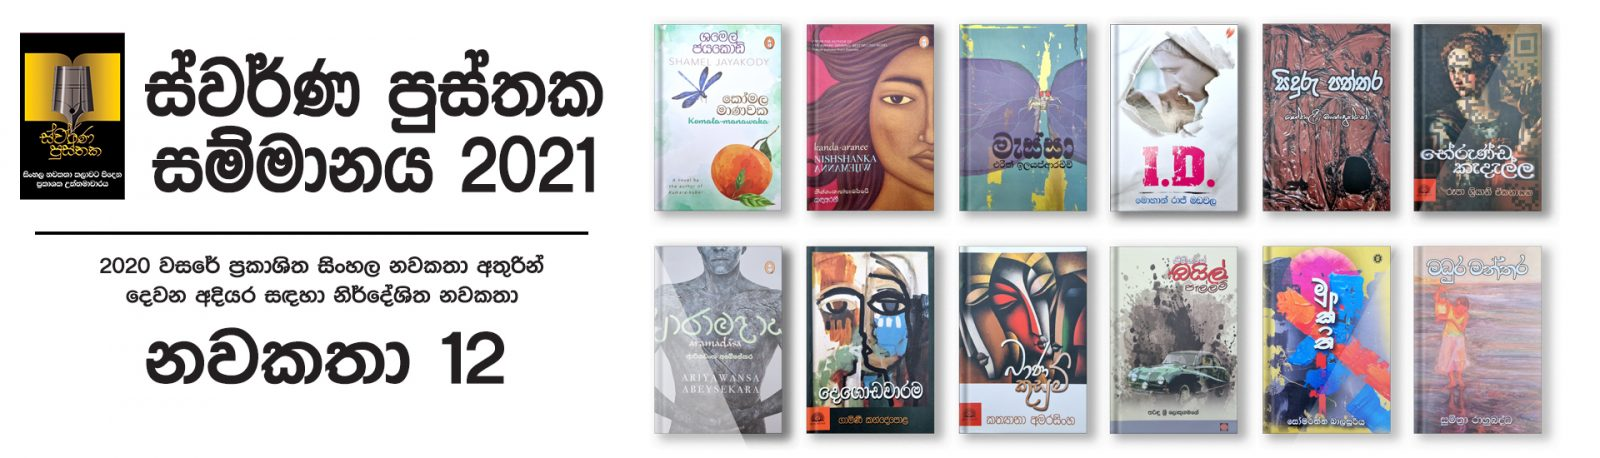 Sarasavi Bookshop Pvt Ltd